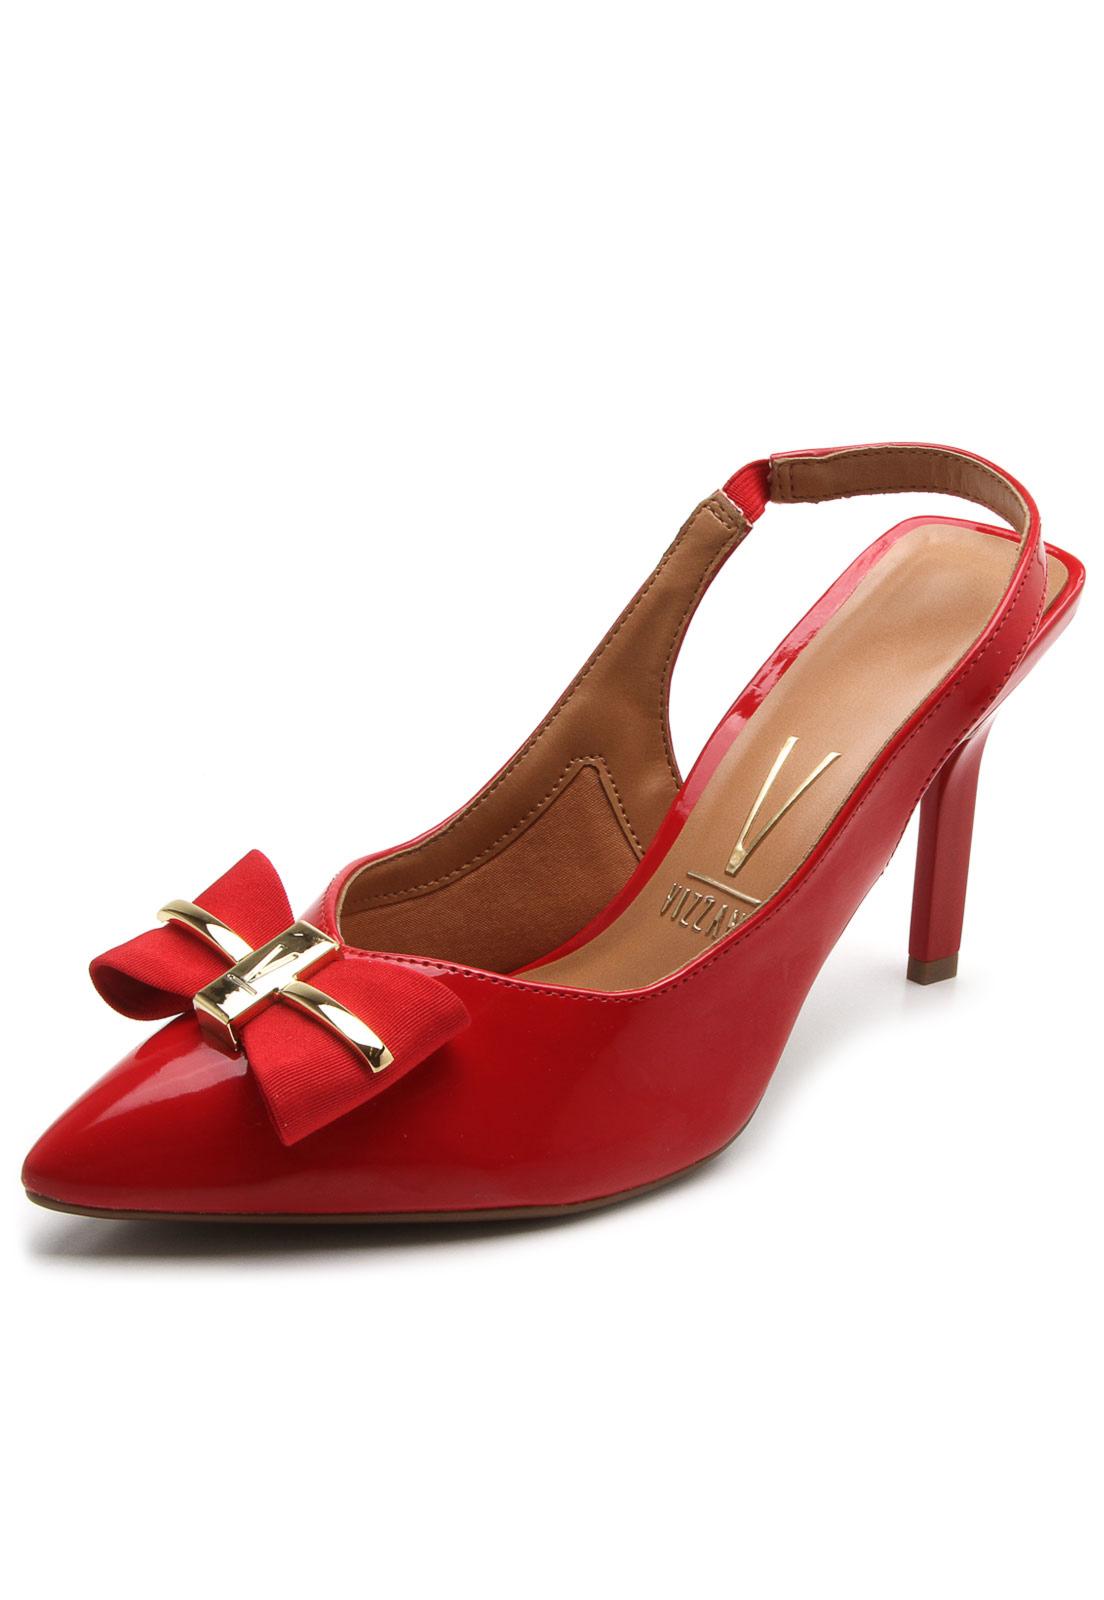 e2b819621 Scarpin Vizzano Laço Vermelho in 2019 | sapato e bolsas | Scarpin ...